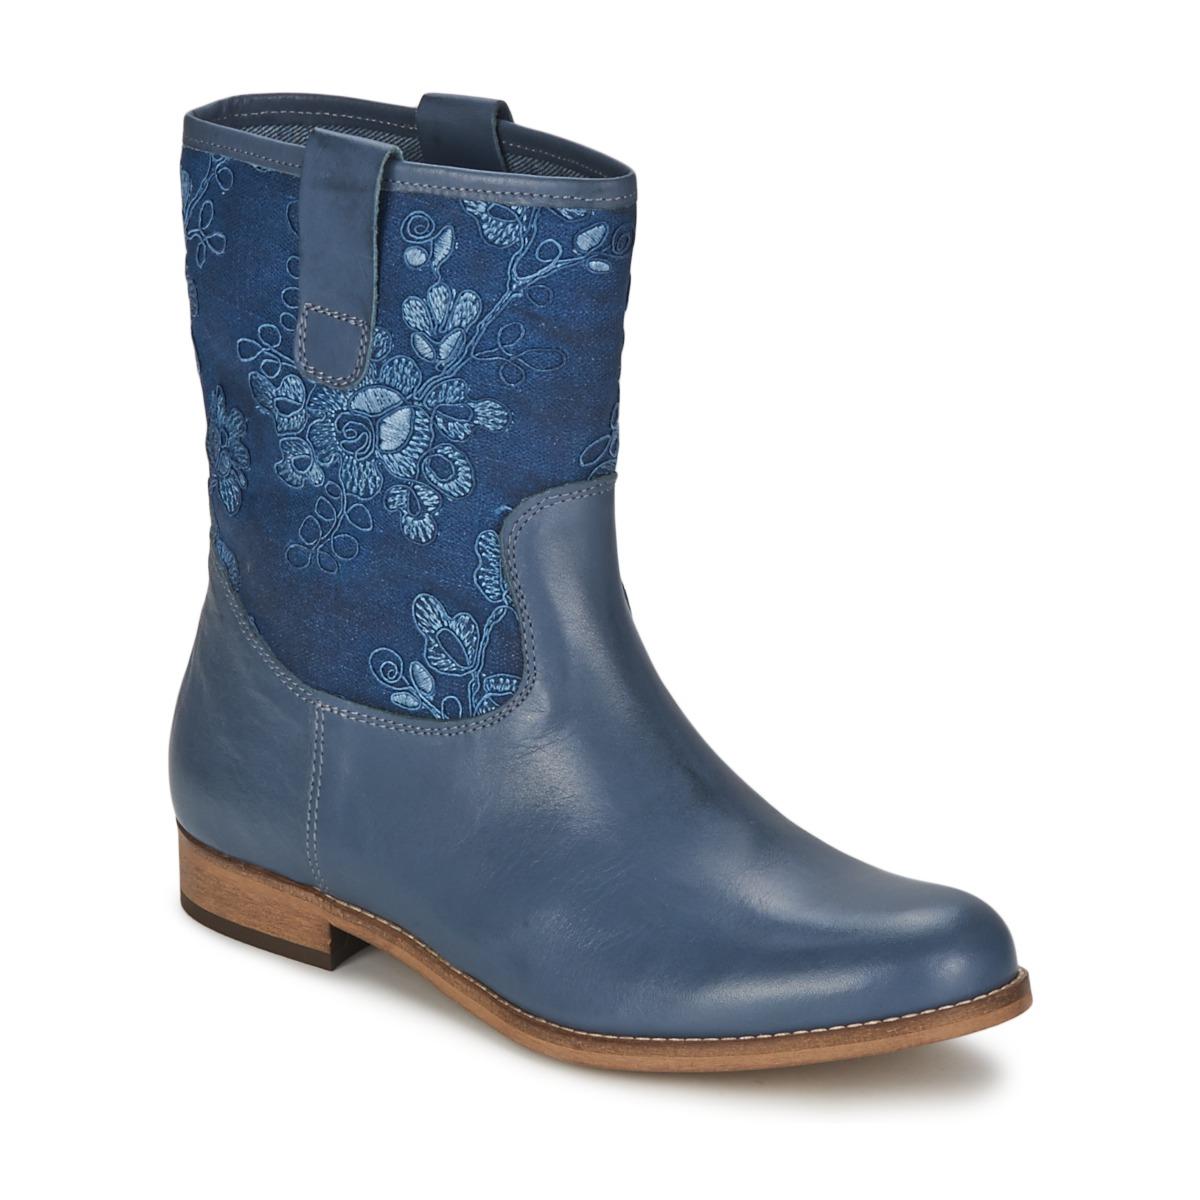 Alba Moda FALINA Blau - Kostenloser Versand bei Spartoode ! - Schuhe Boots Damen 70,00 €